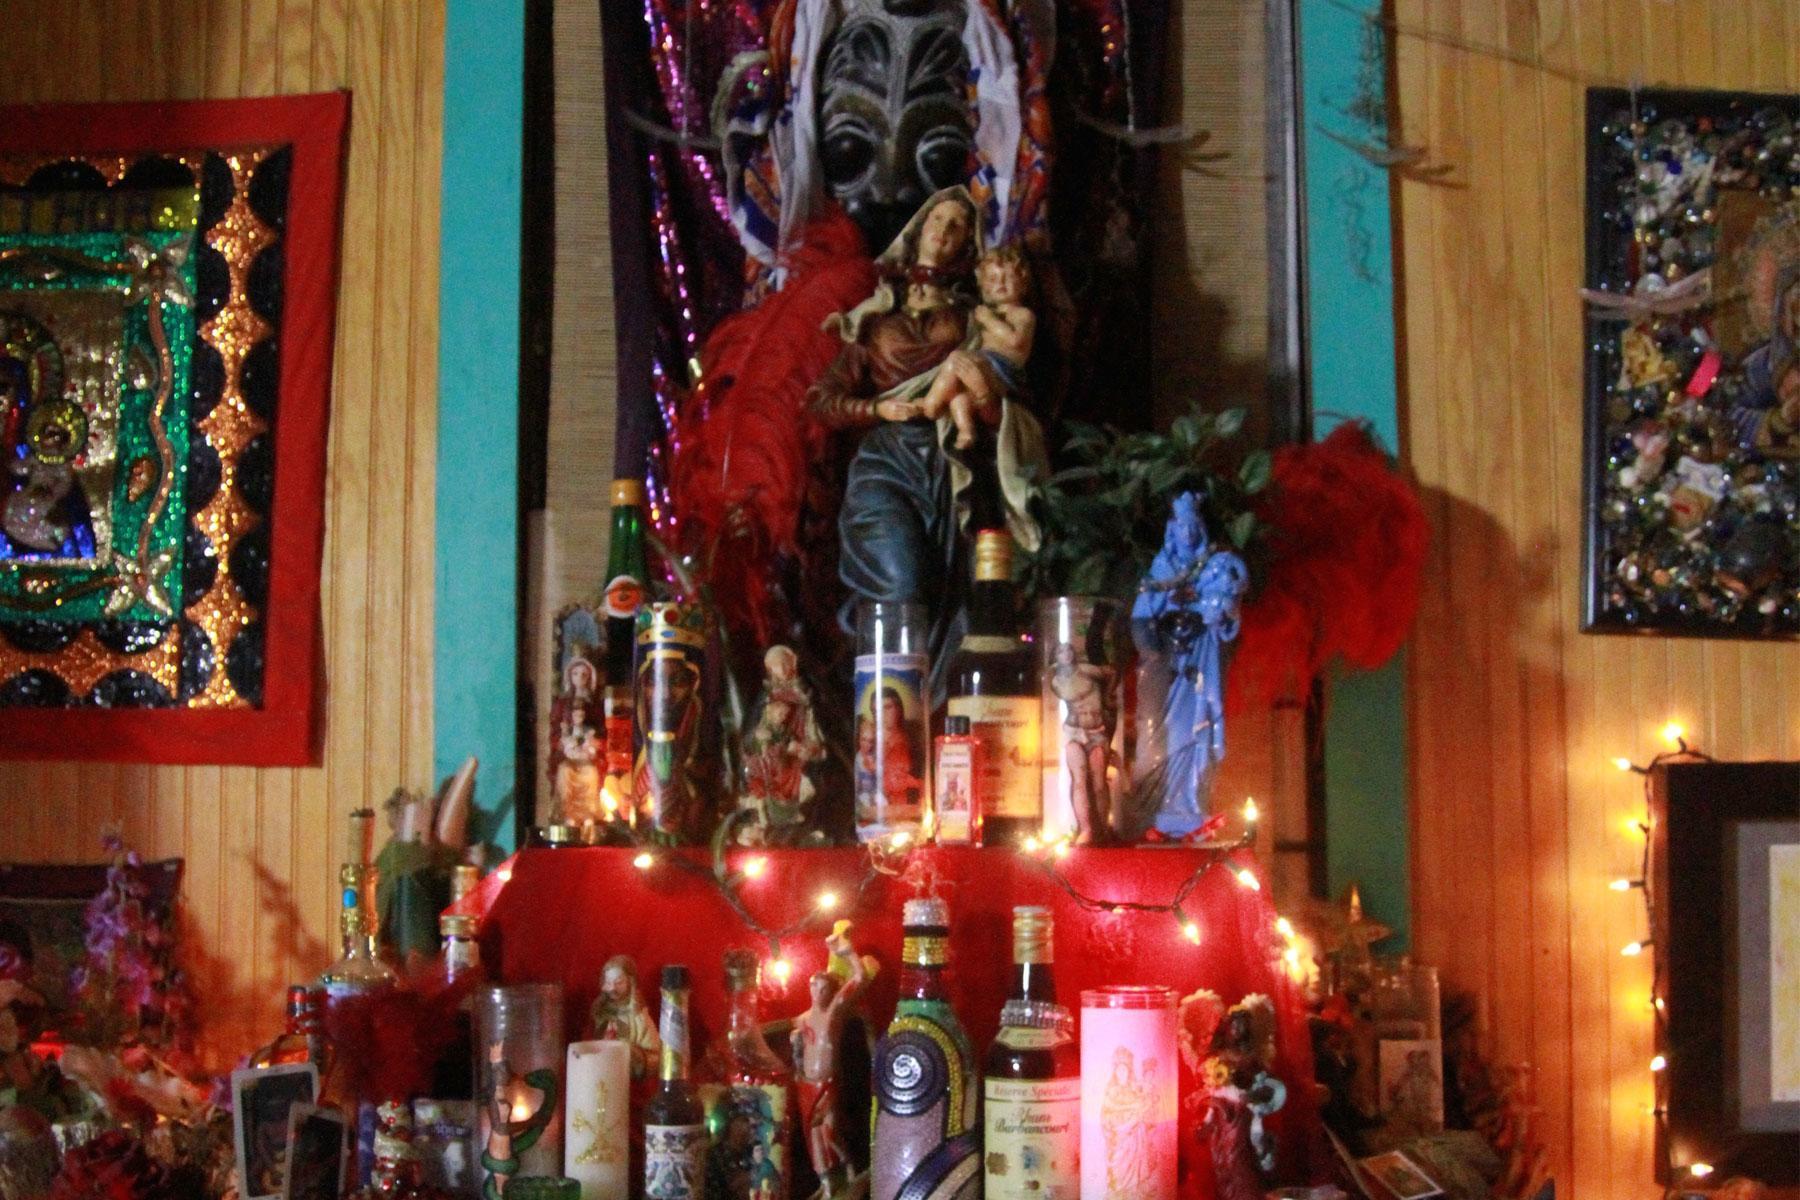 How to Participate in Voodoo (Vodou) Ceremonies in New Orleans